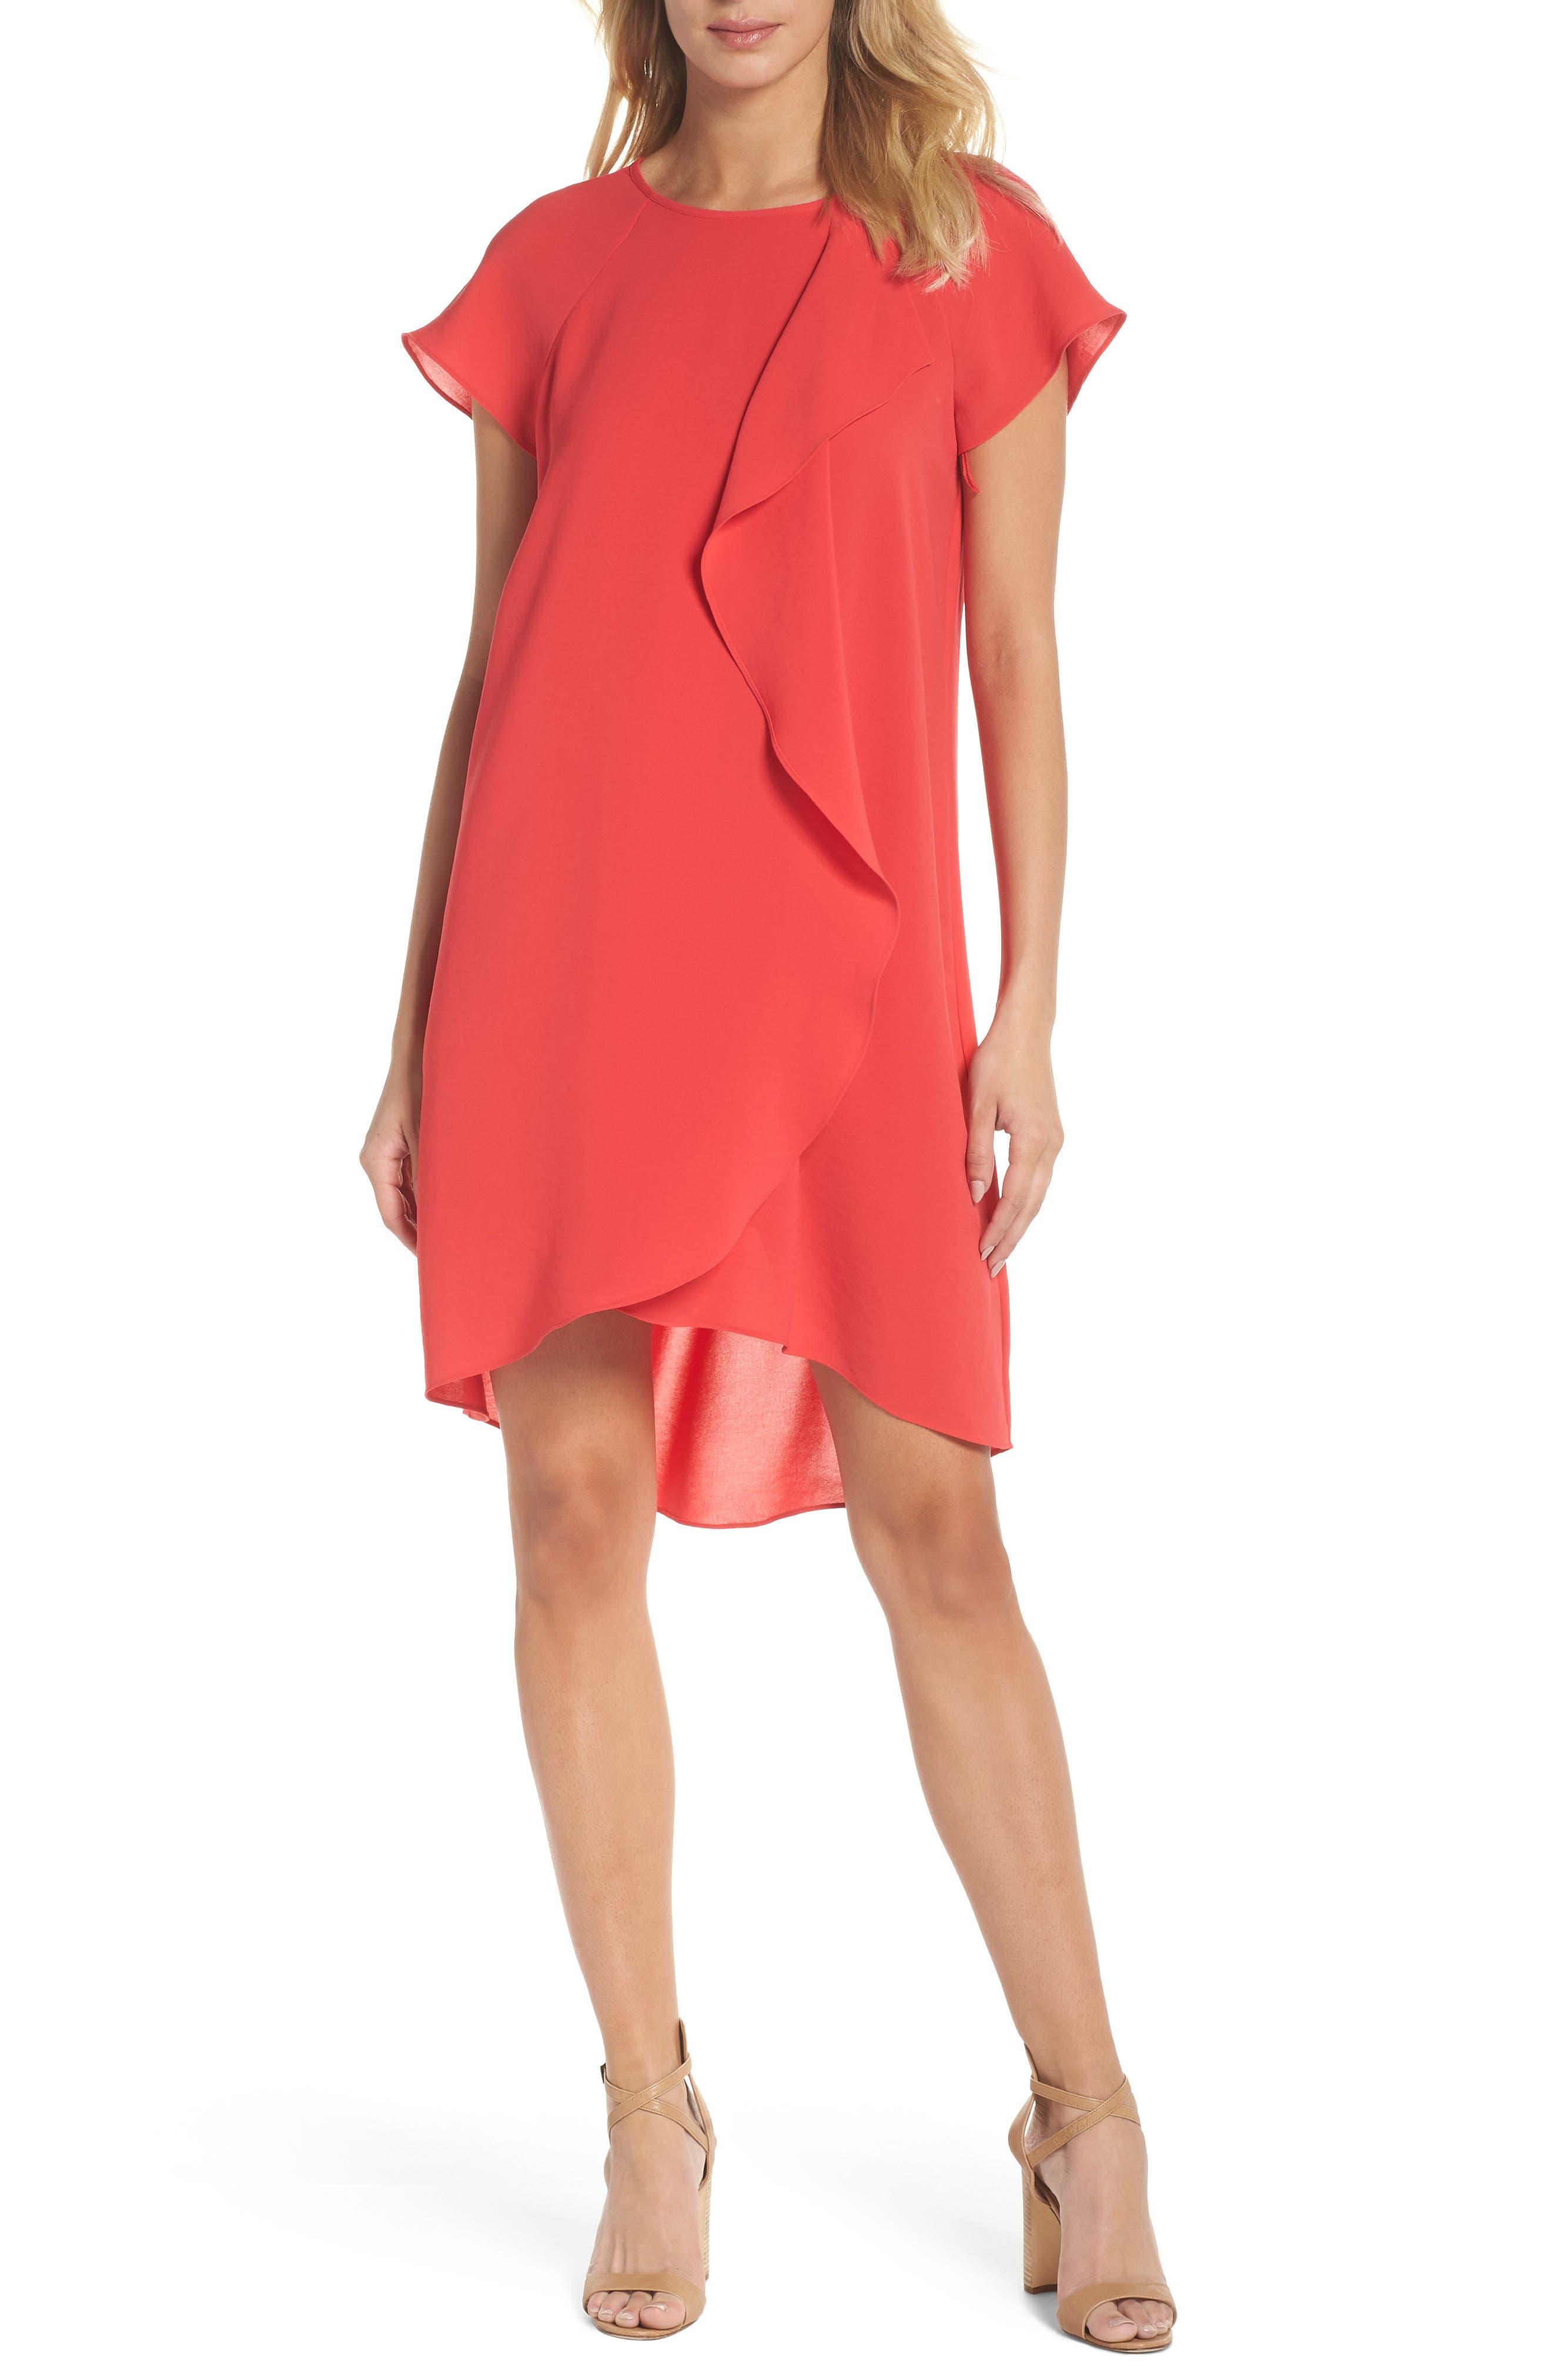 ADRIANNA PAPELL, Crepe Shift Dress, Main thumbnail 1, color, 650